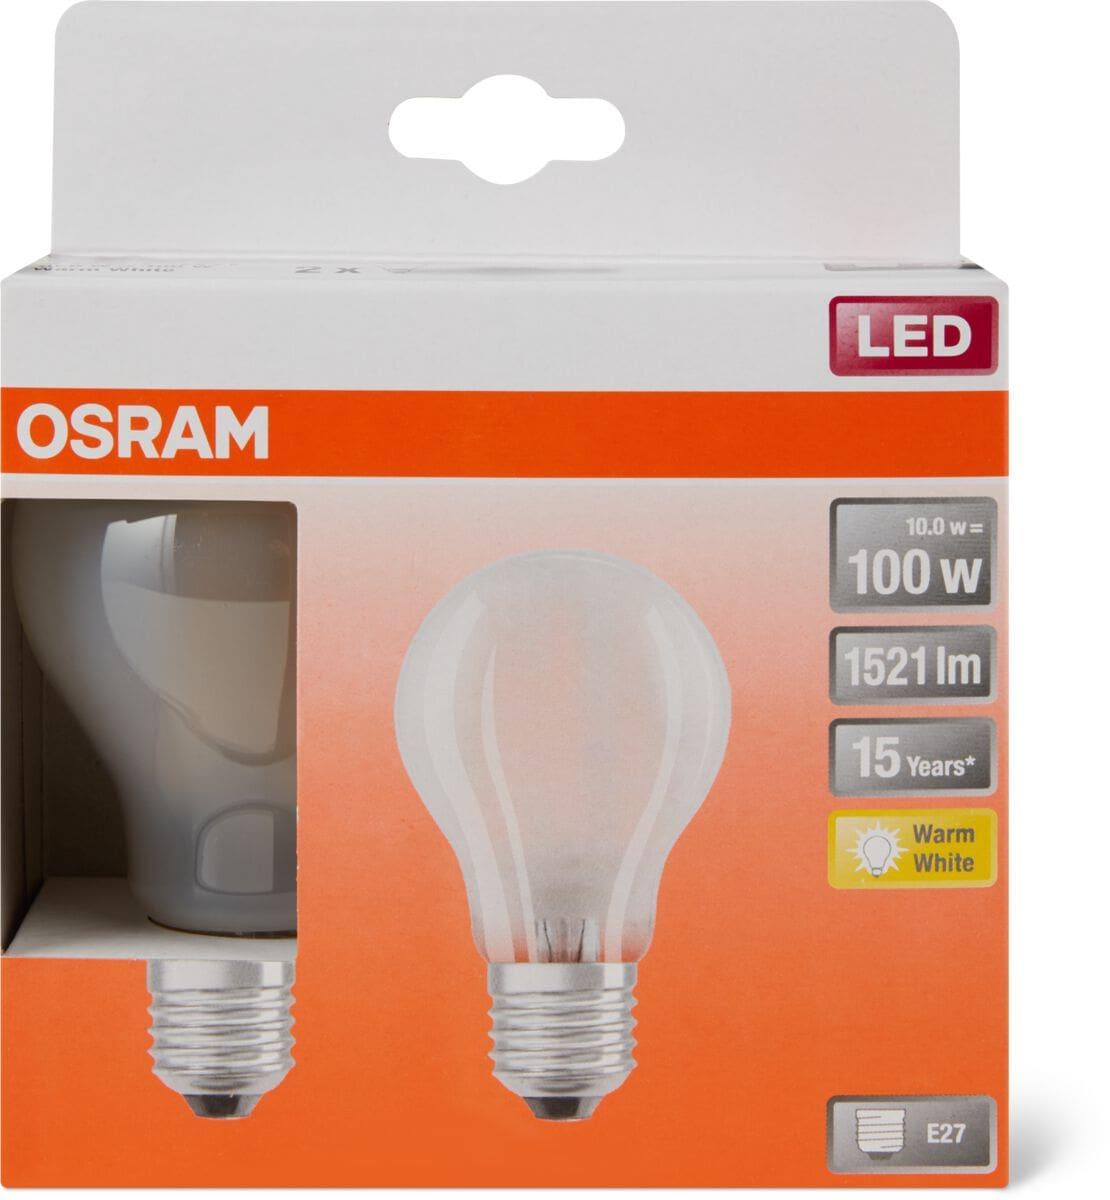 Osram LED Retrofit CLASSIC A100 2700K E27 DUO